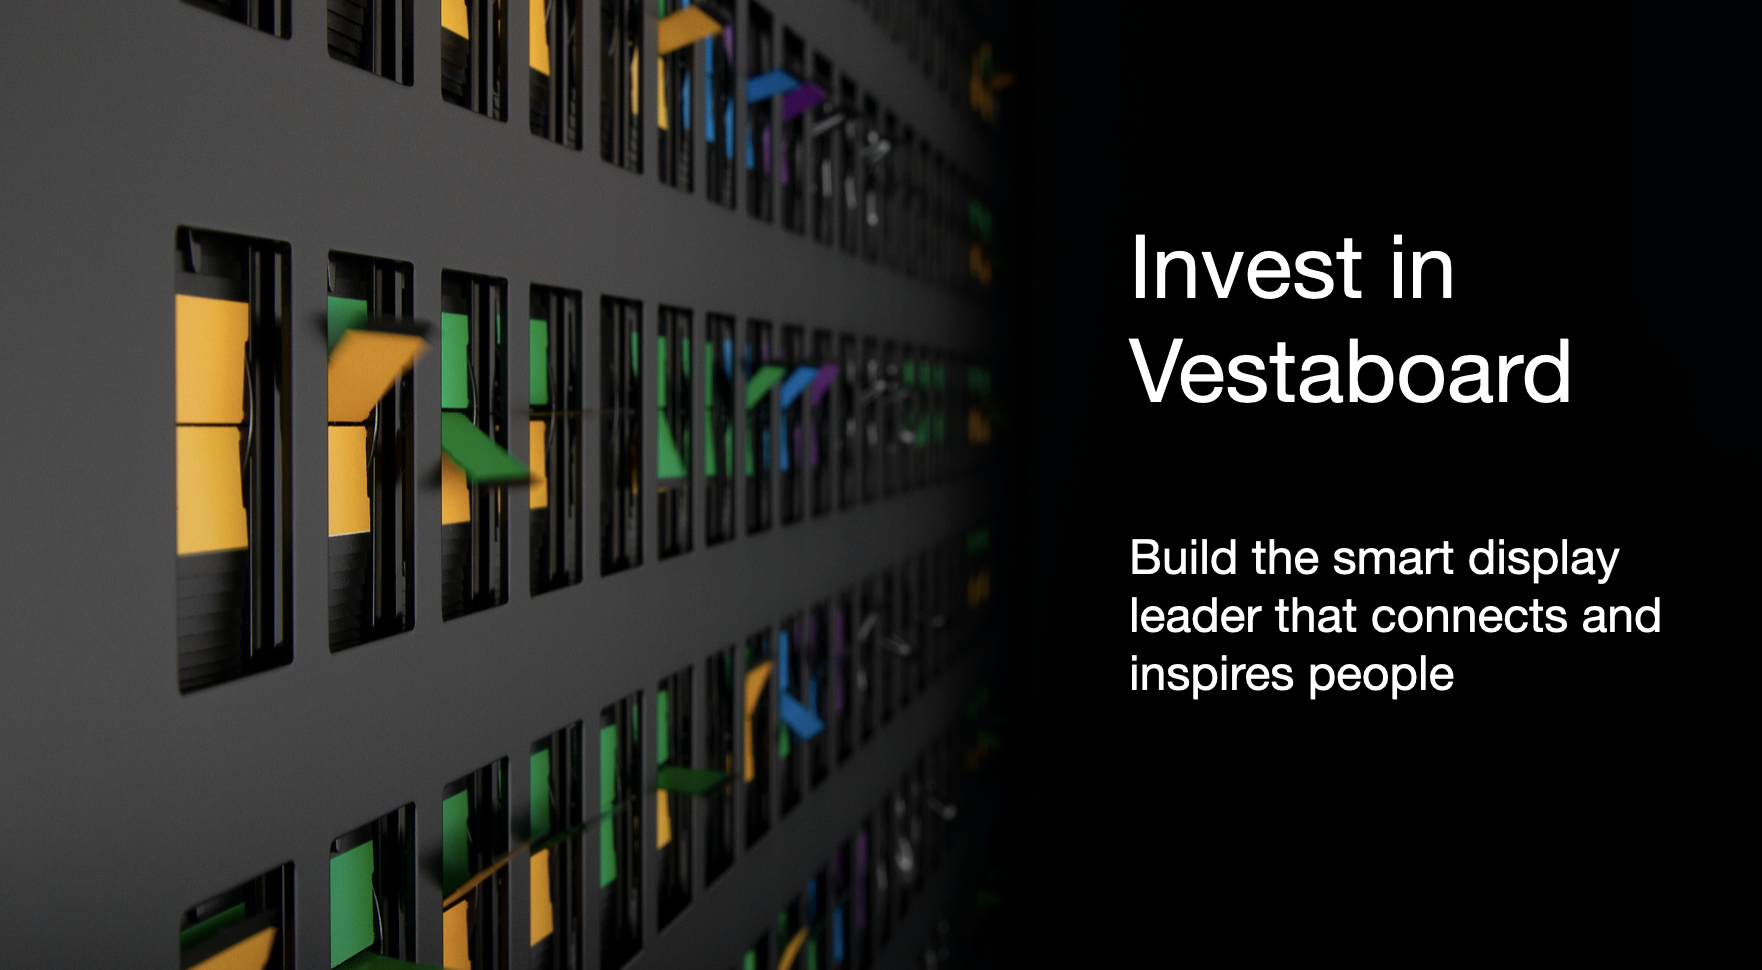 Invest in Vestaboard